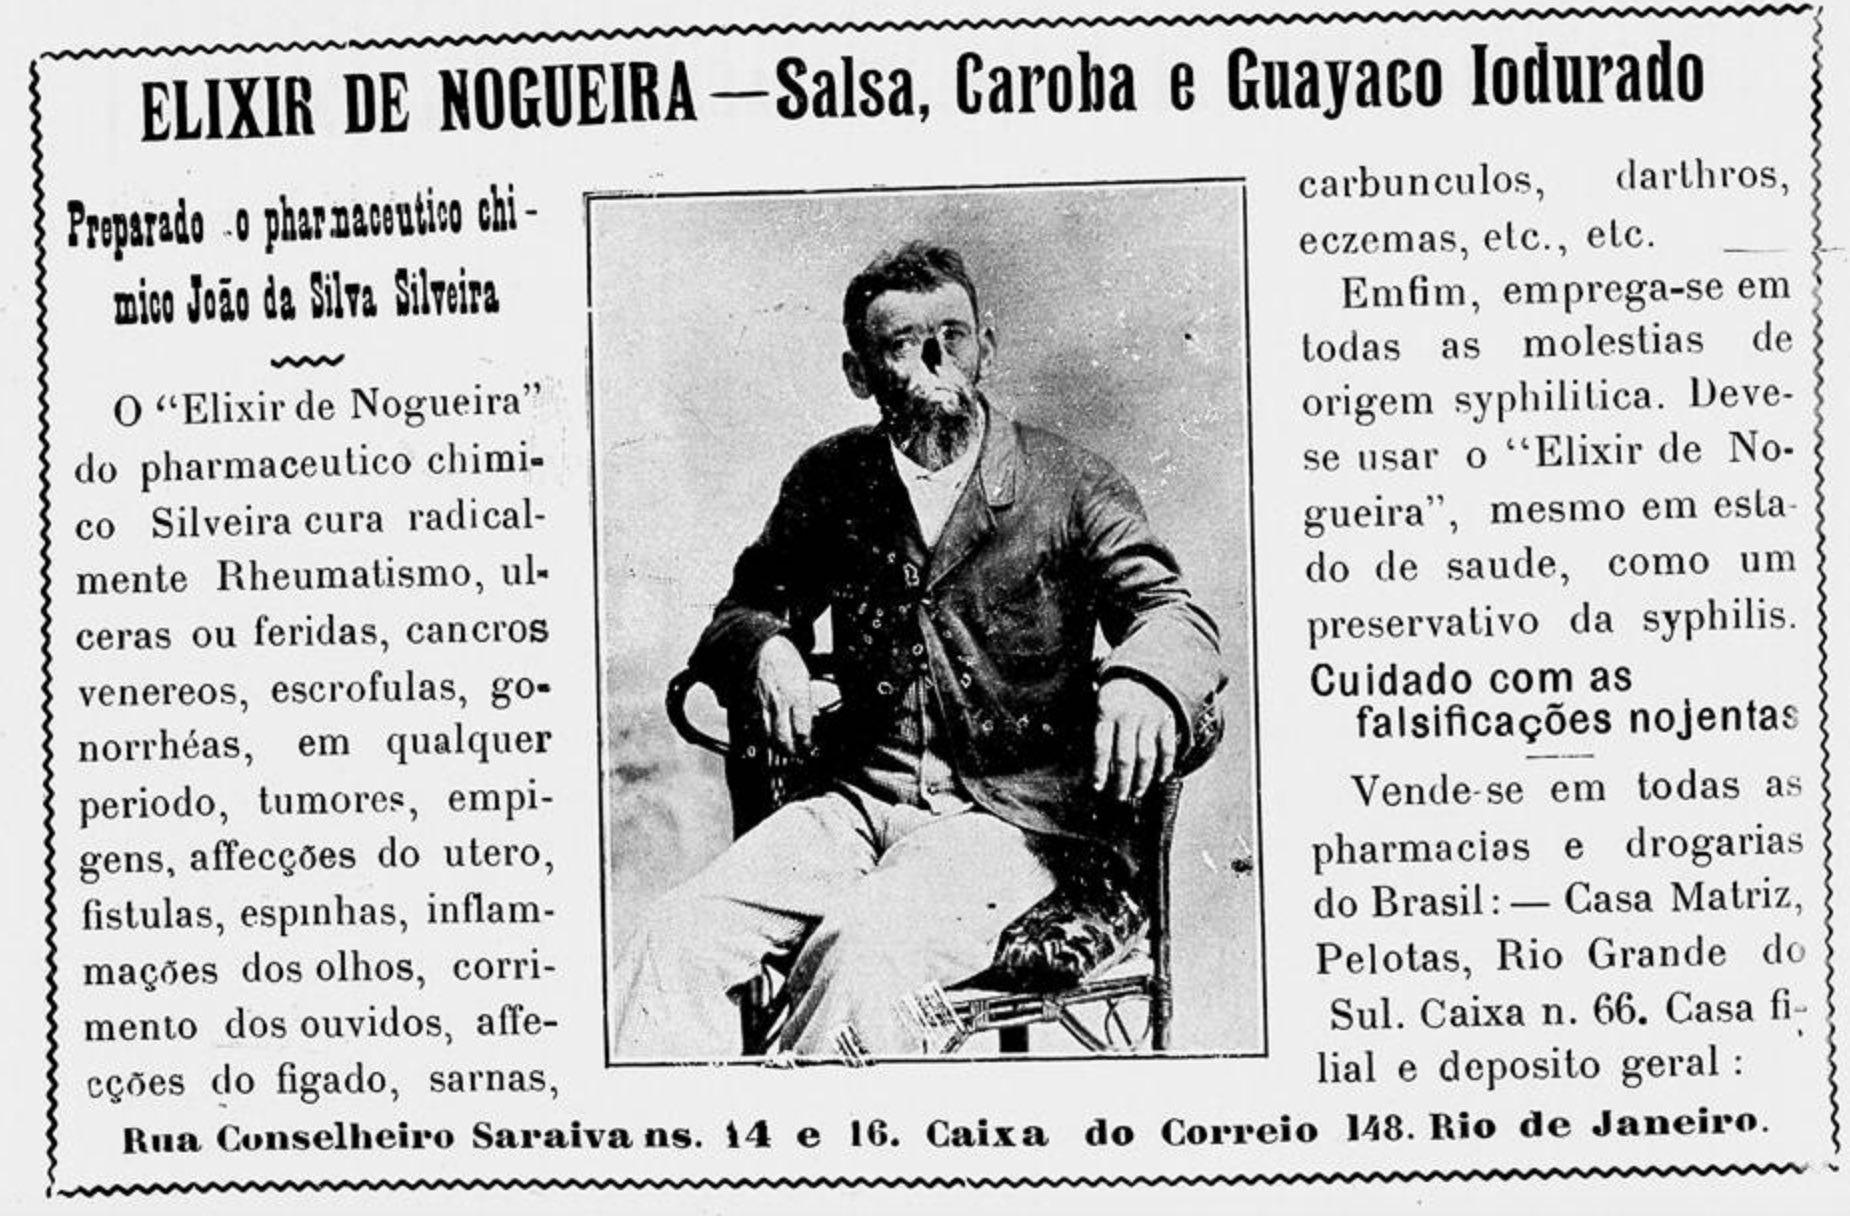 Anúncio de 1911 promovendo os benefícios do Elixir de Nogueira